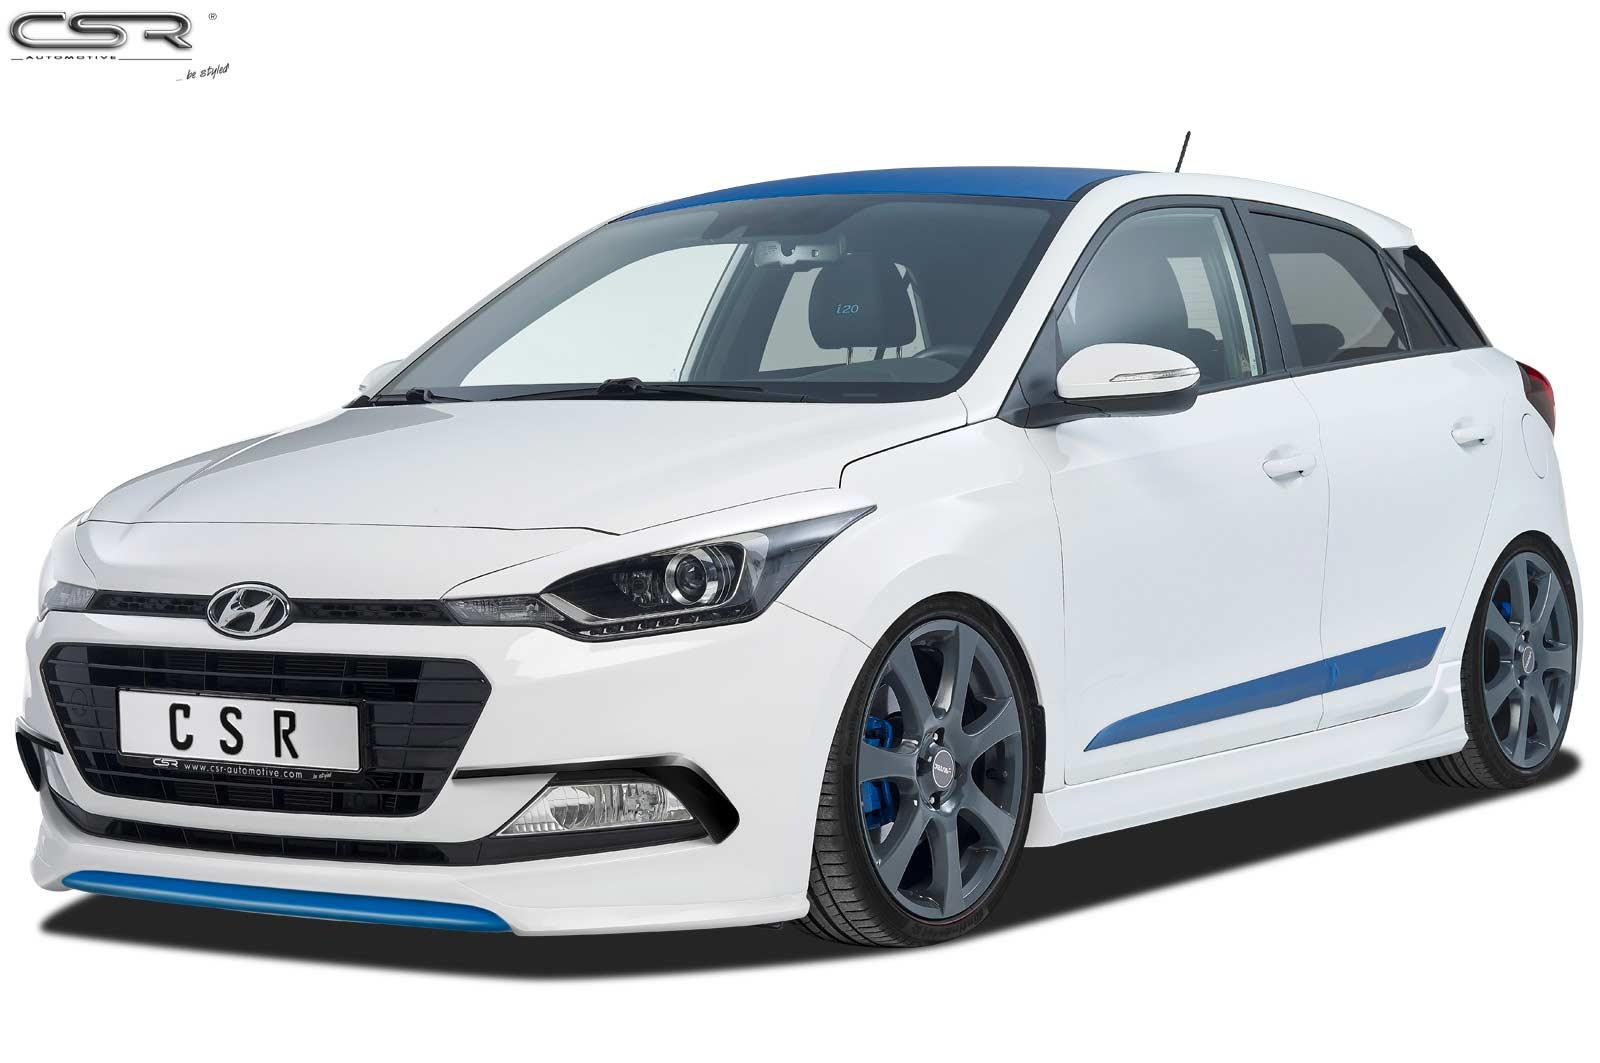 CSR Frontansatz für Hyundai I20 GB FA275